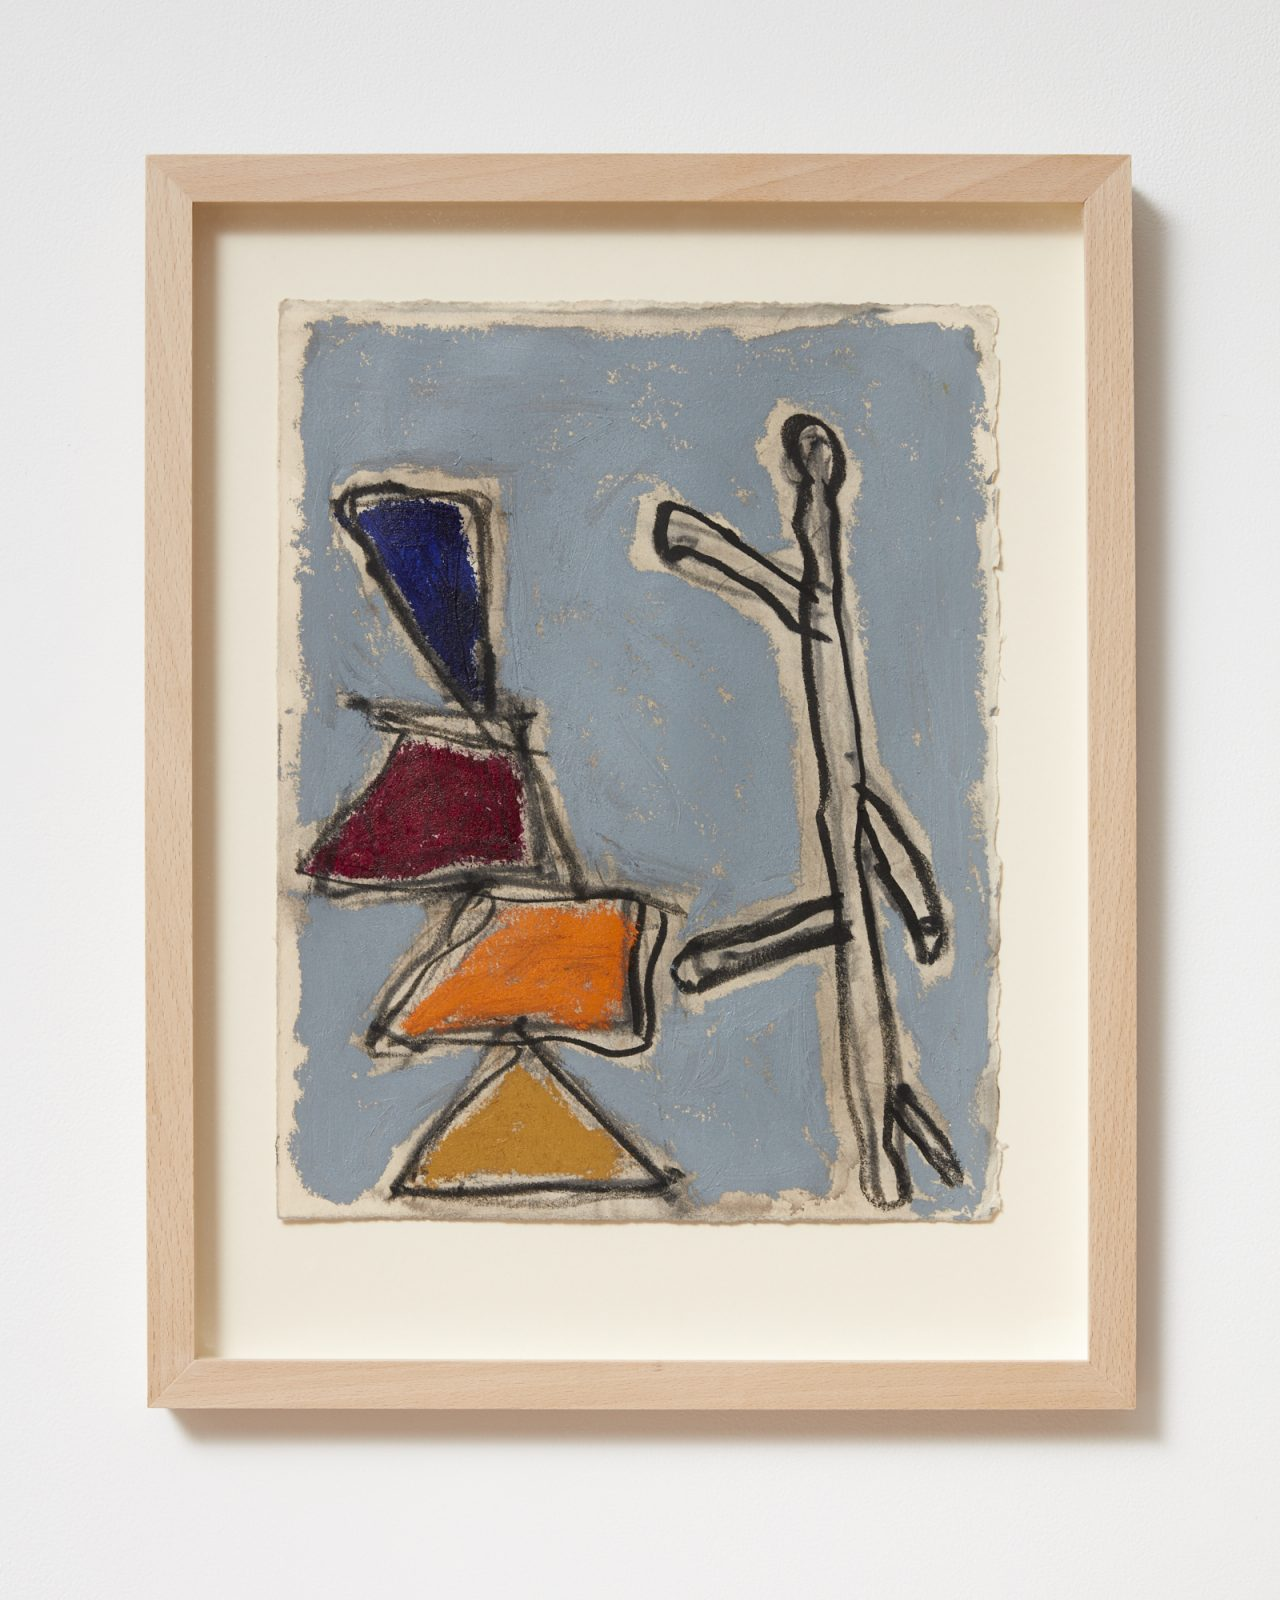 Basil Beattie featured artwork